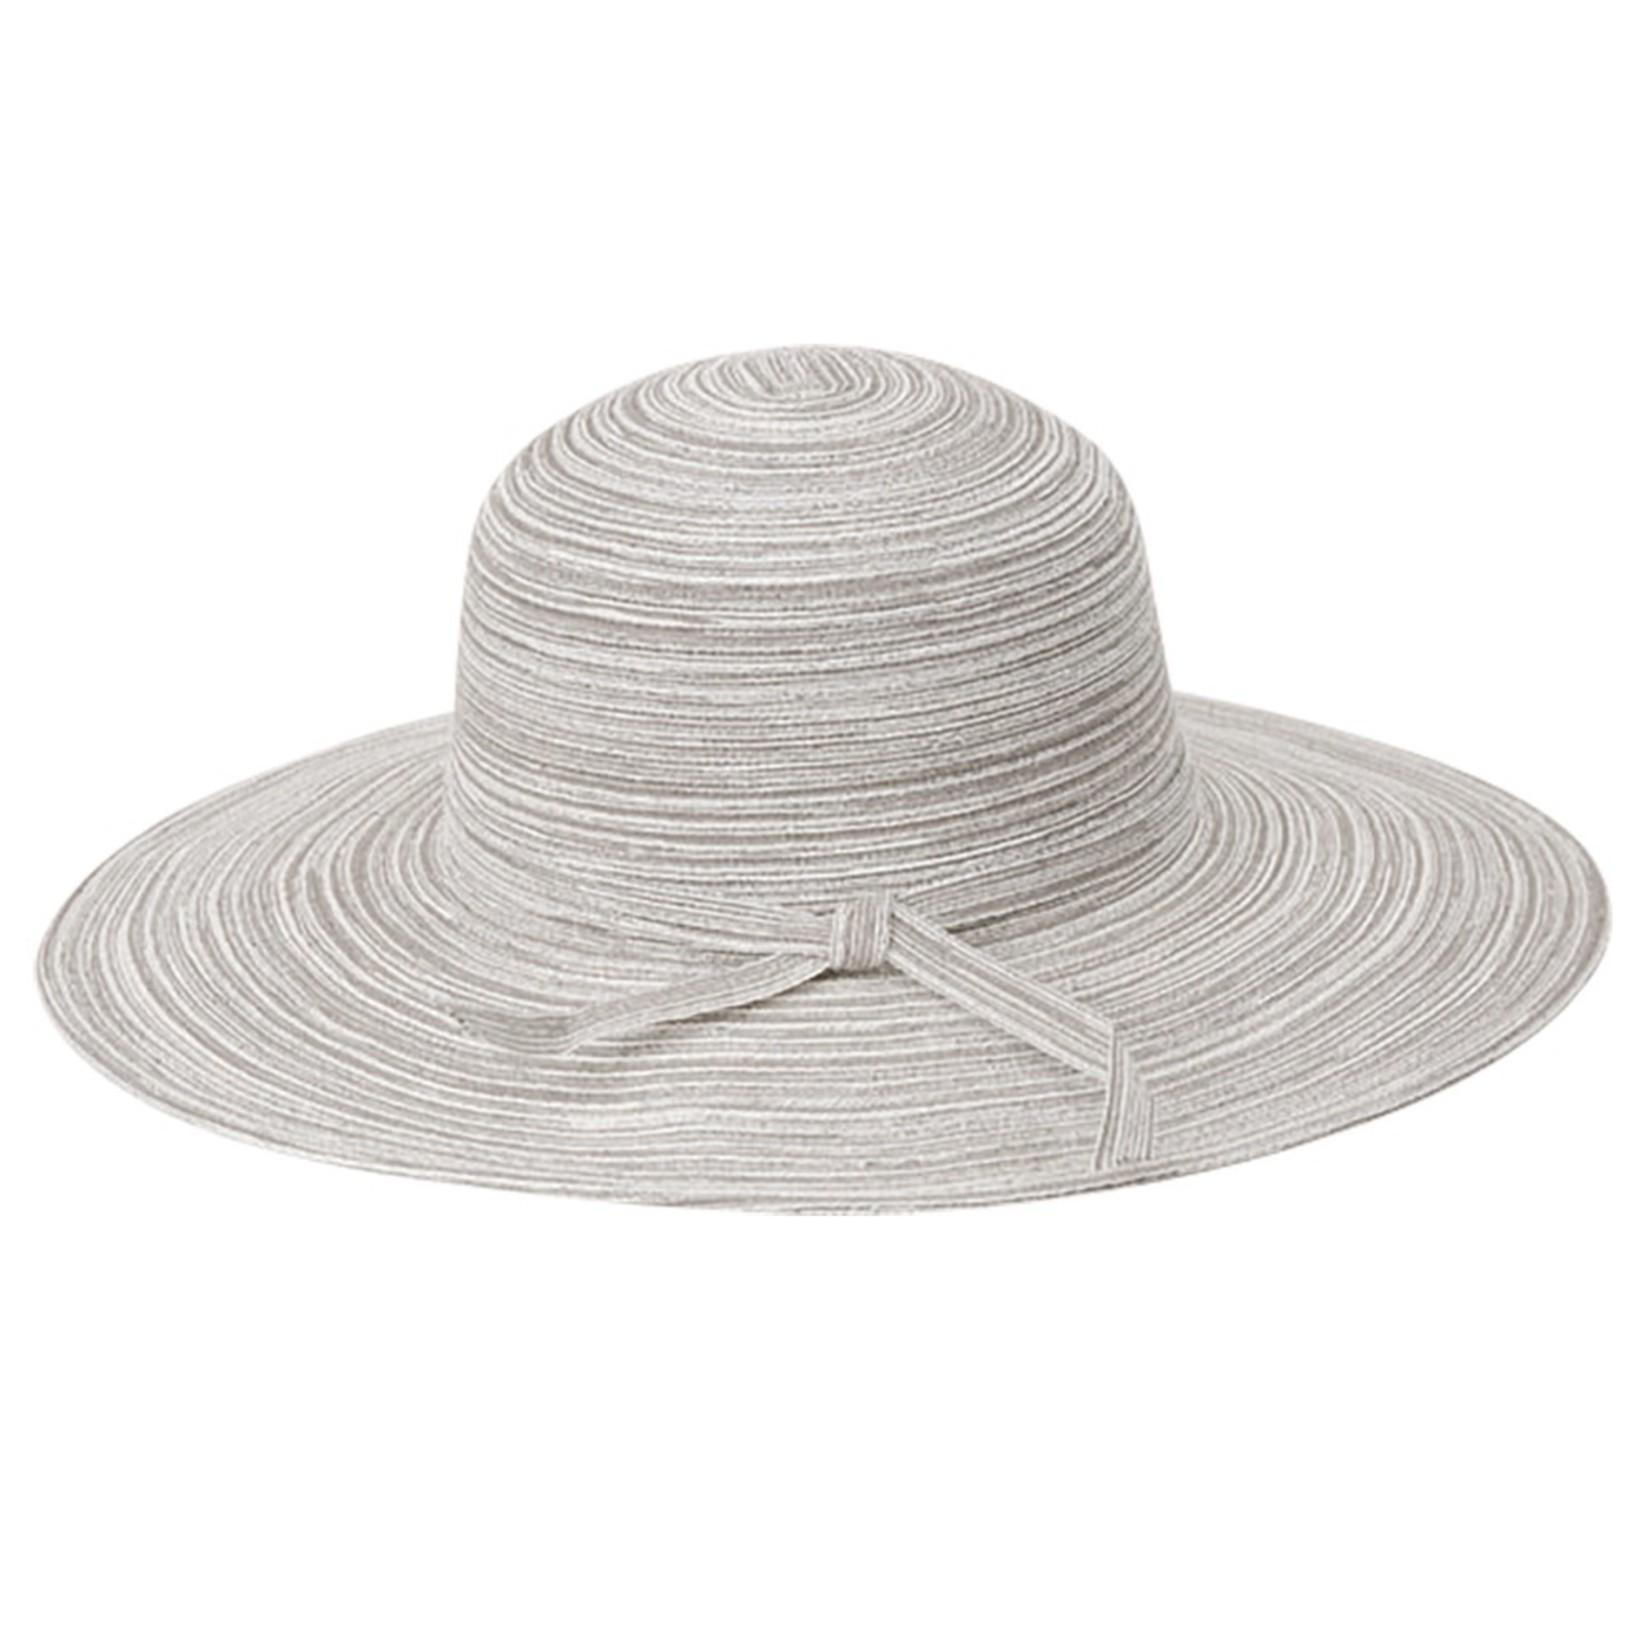 Jeanne Simmons Silver Braid Metallic Brimmed Hat